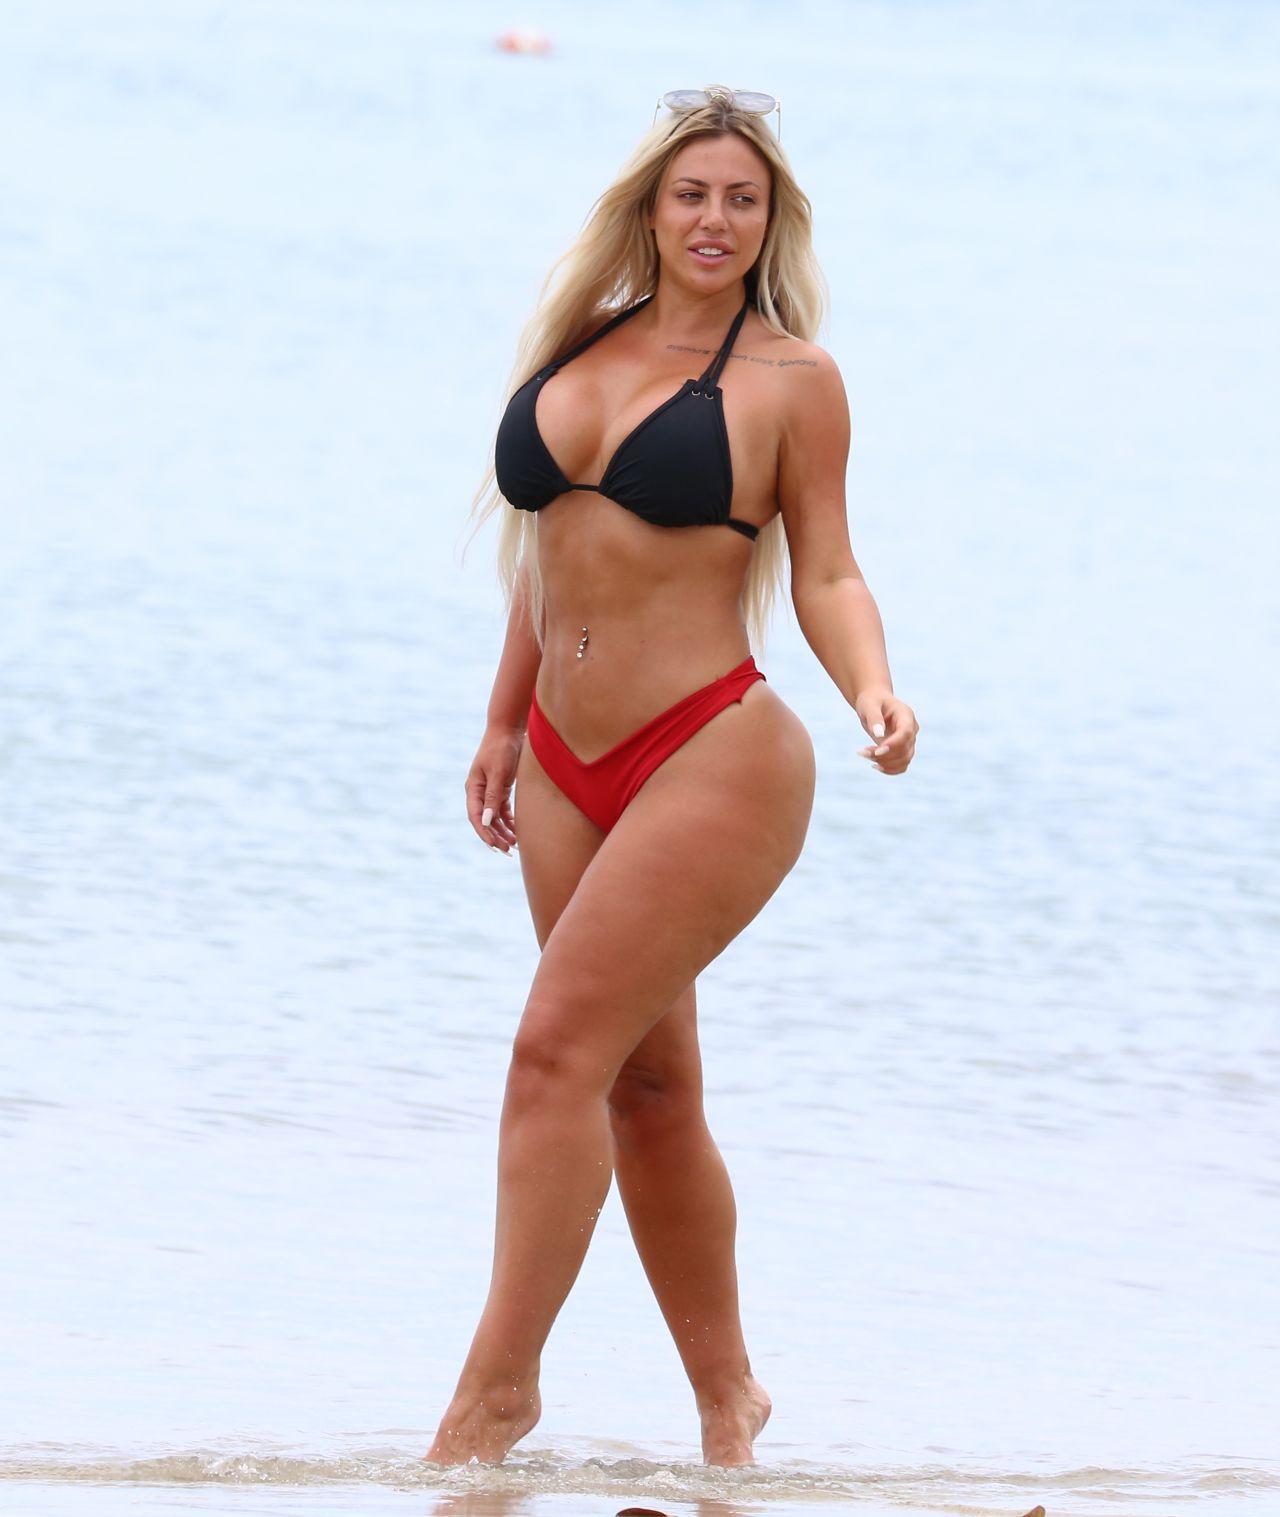 Holly Hagan In Bikini At The Beach In St Lucia 05162018-3870